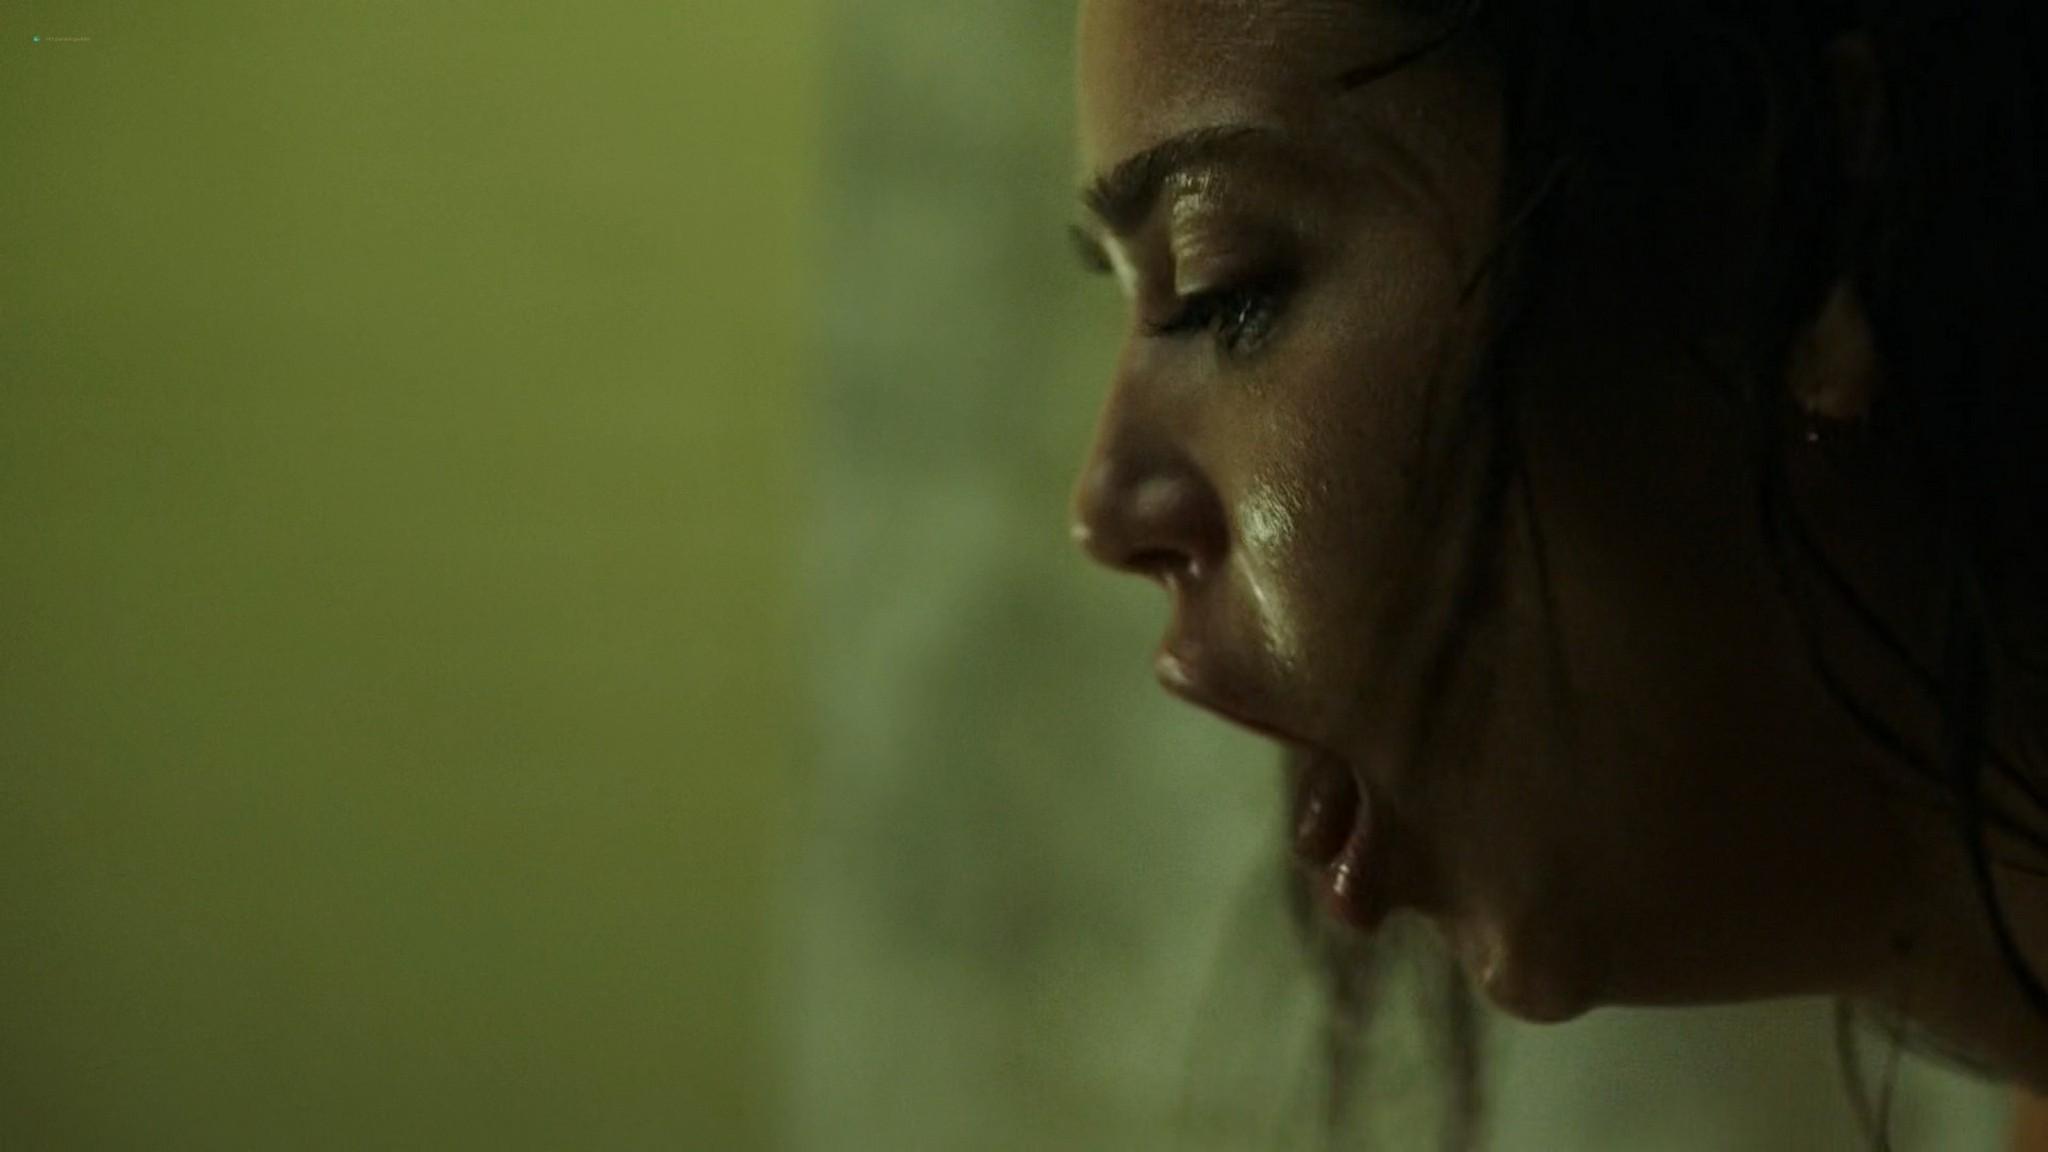 Matilda Anna Ingrid Lutz hot and sexy Rings 2017 1080p BluRay 13